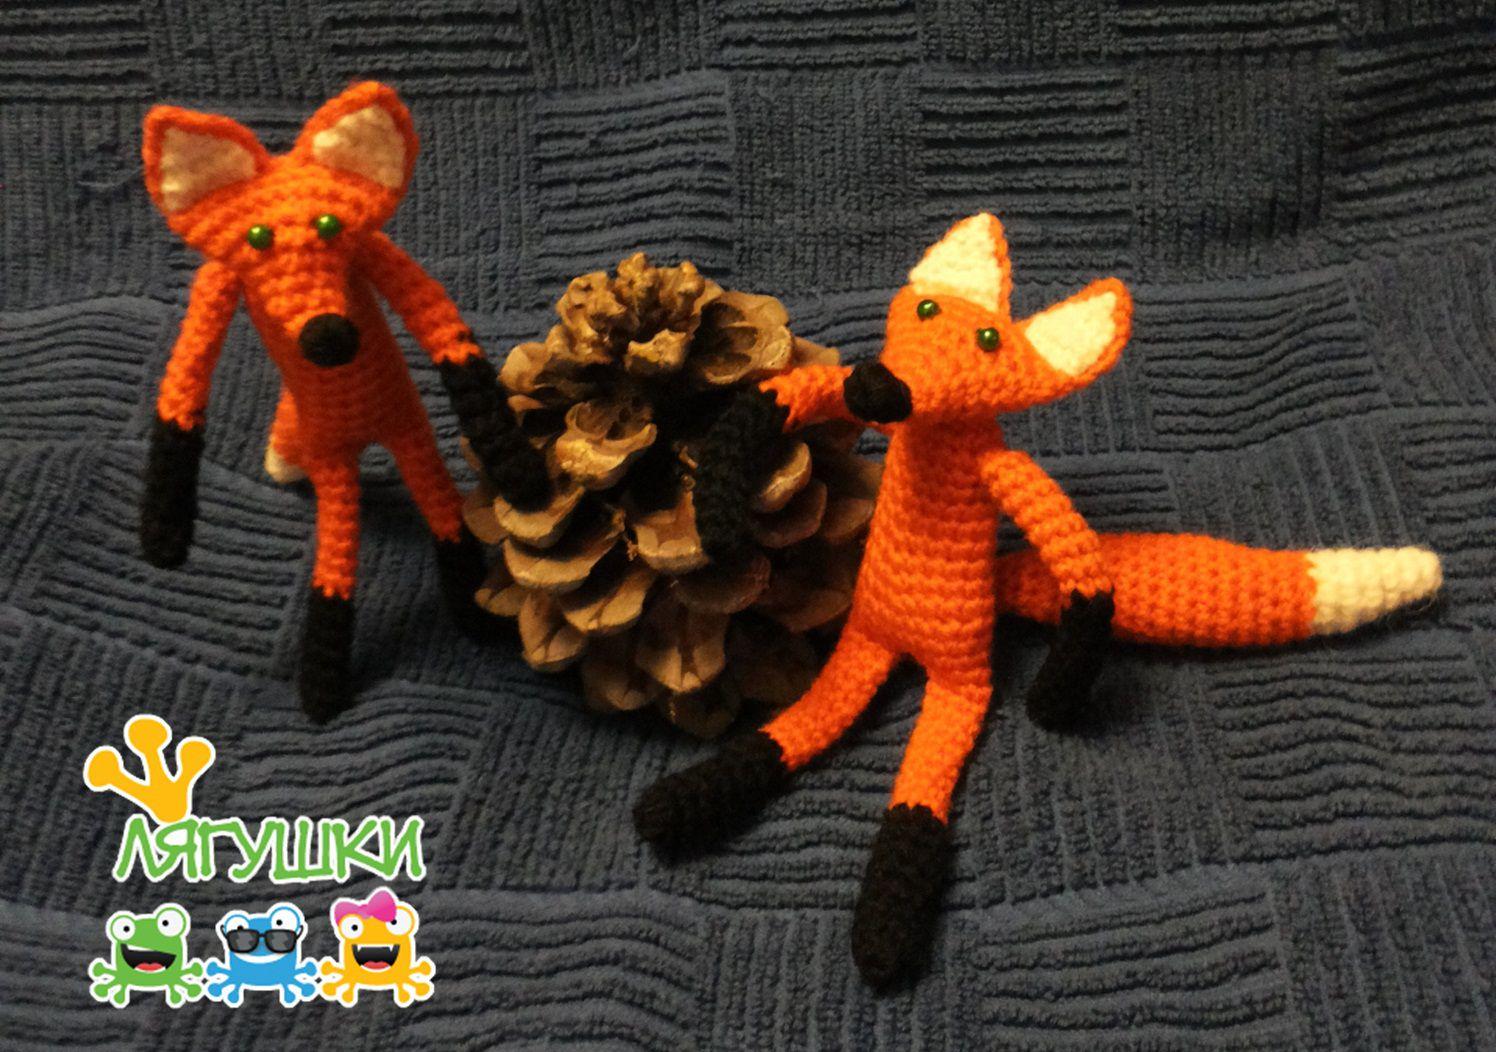 фырфыр лисичкасестричка kidstoy softtoy детям мягкаяигрушка лисичка лиса вязанаяигрушка трилягушки redfox stuffedtoy fox crochet рыжеечудо